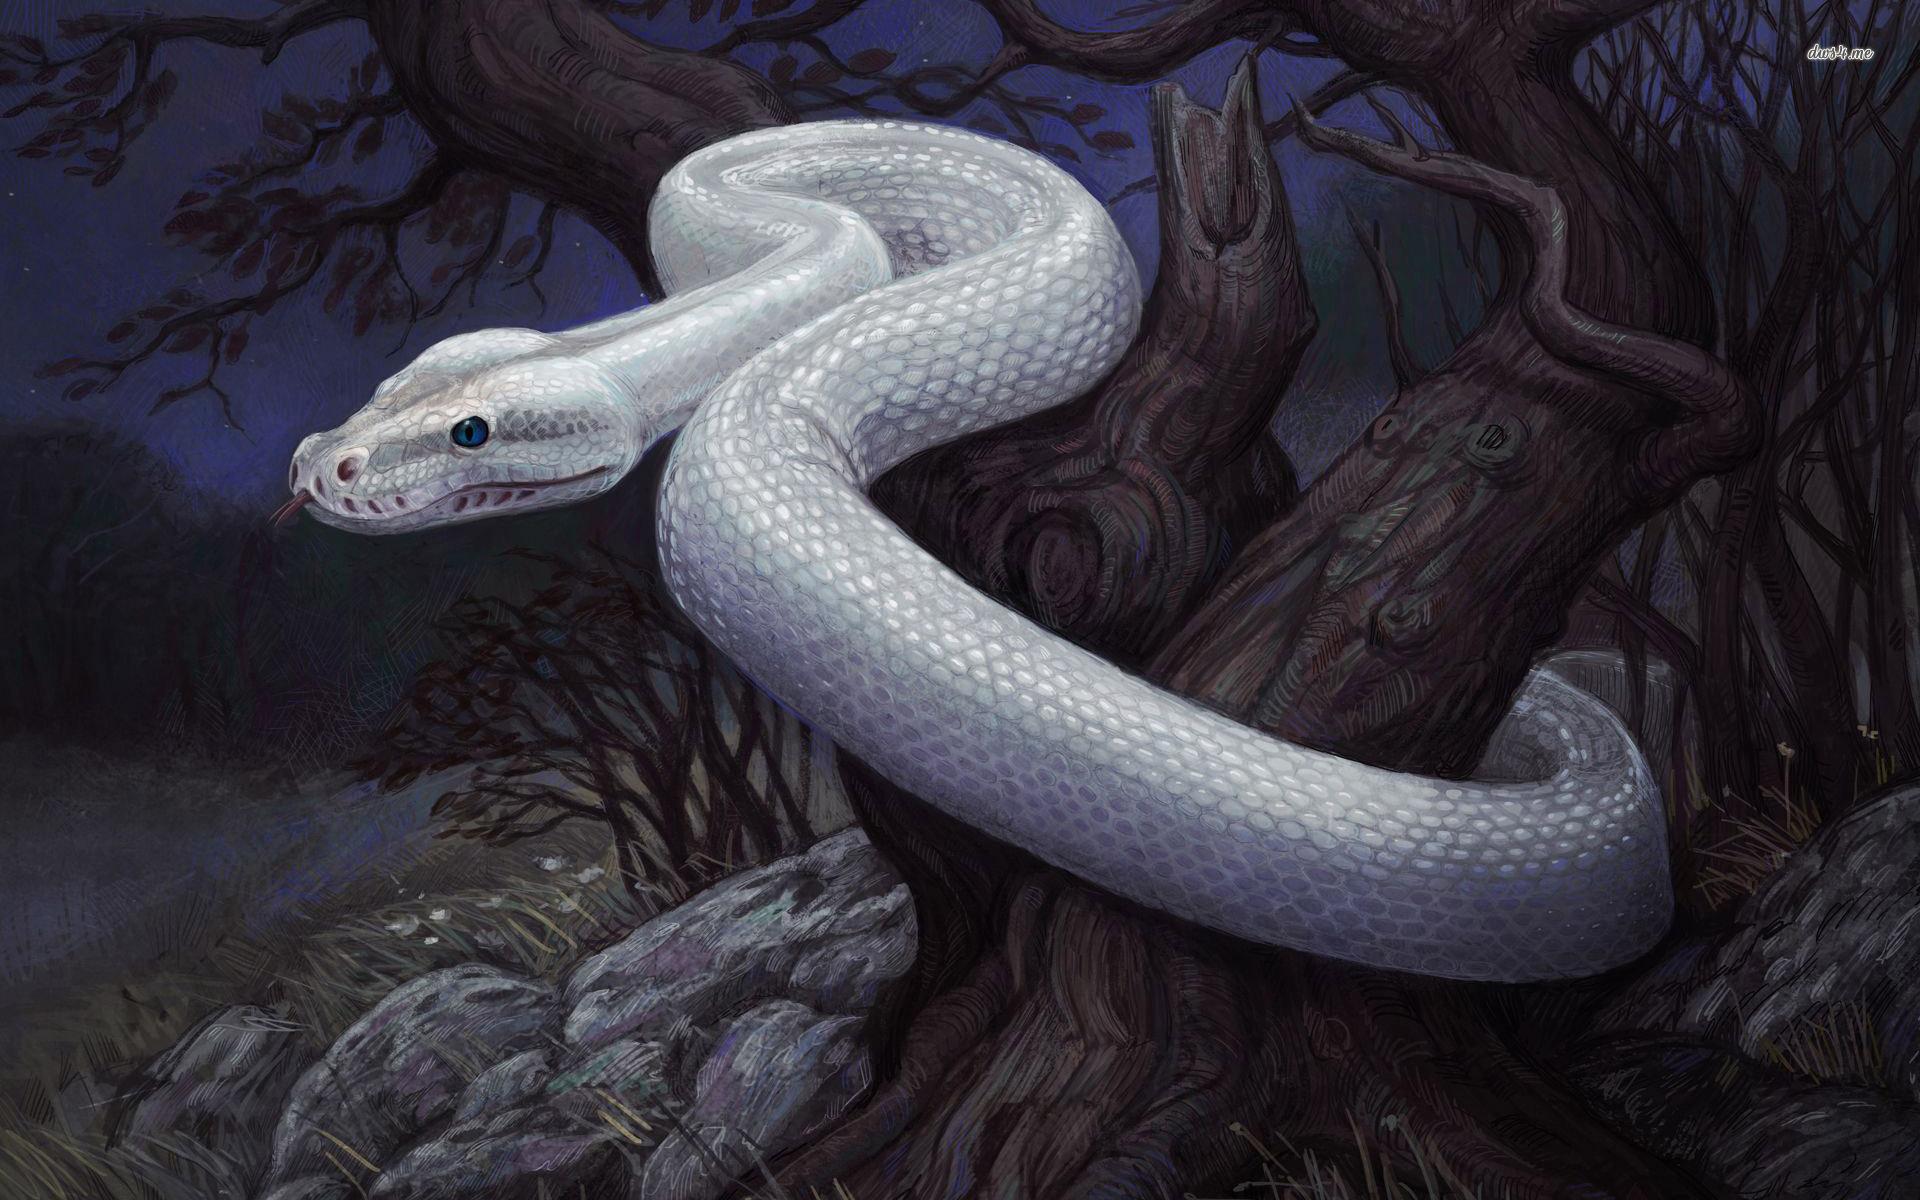 White Snake On Tree Wallpaper Artistic Wallpapers Full Hd Download Horror For Pc Desktop Dangerous Mobile Iphone Android